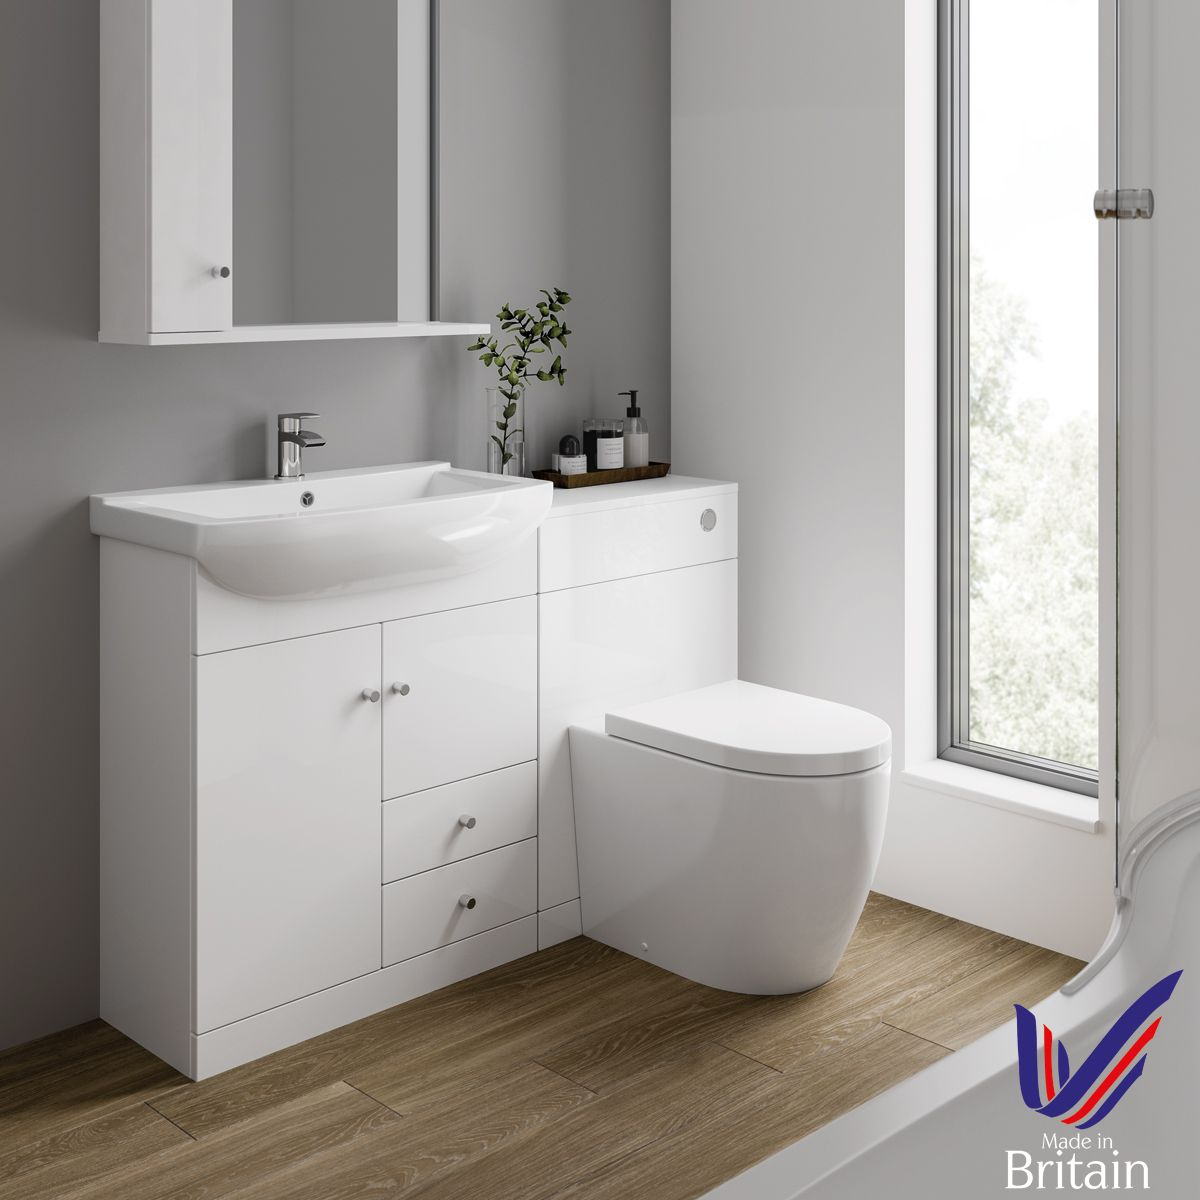 Ikoma White Gloss Vanity Unit with Basin 450mm Lifestyle